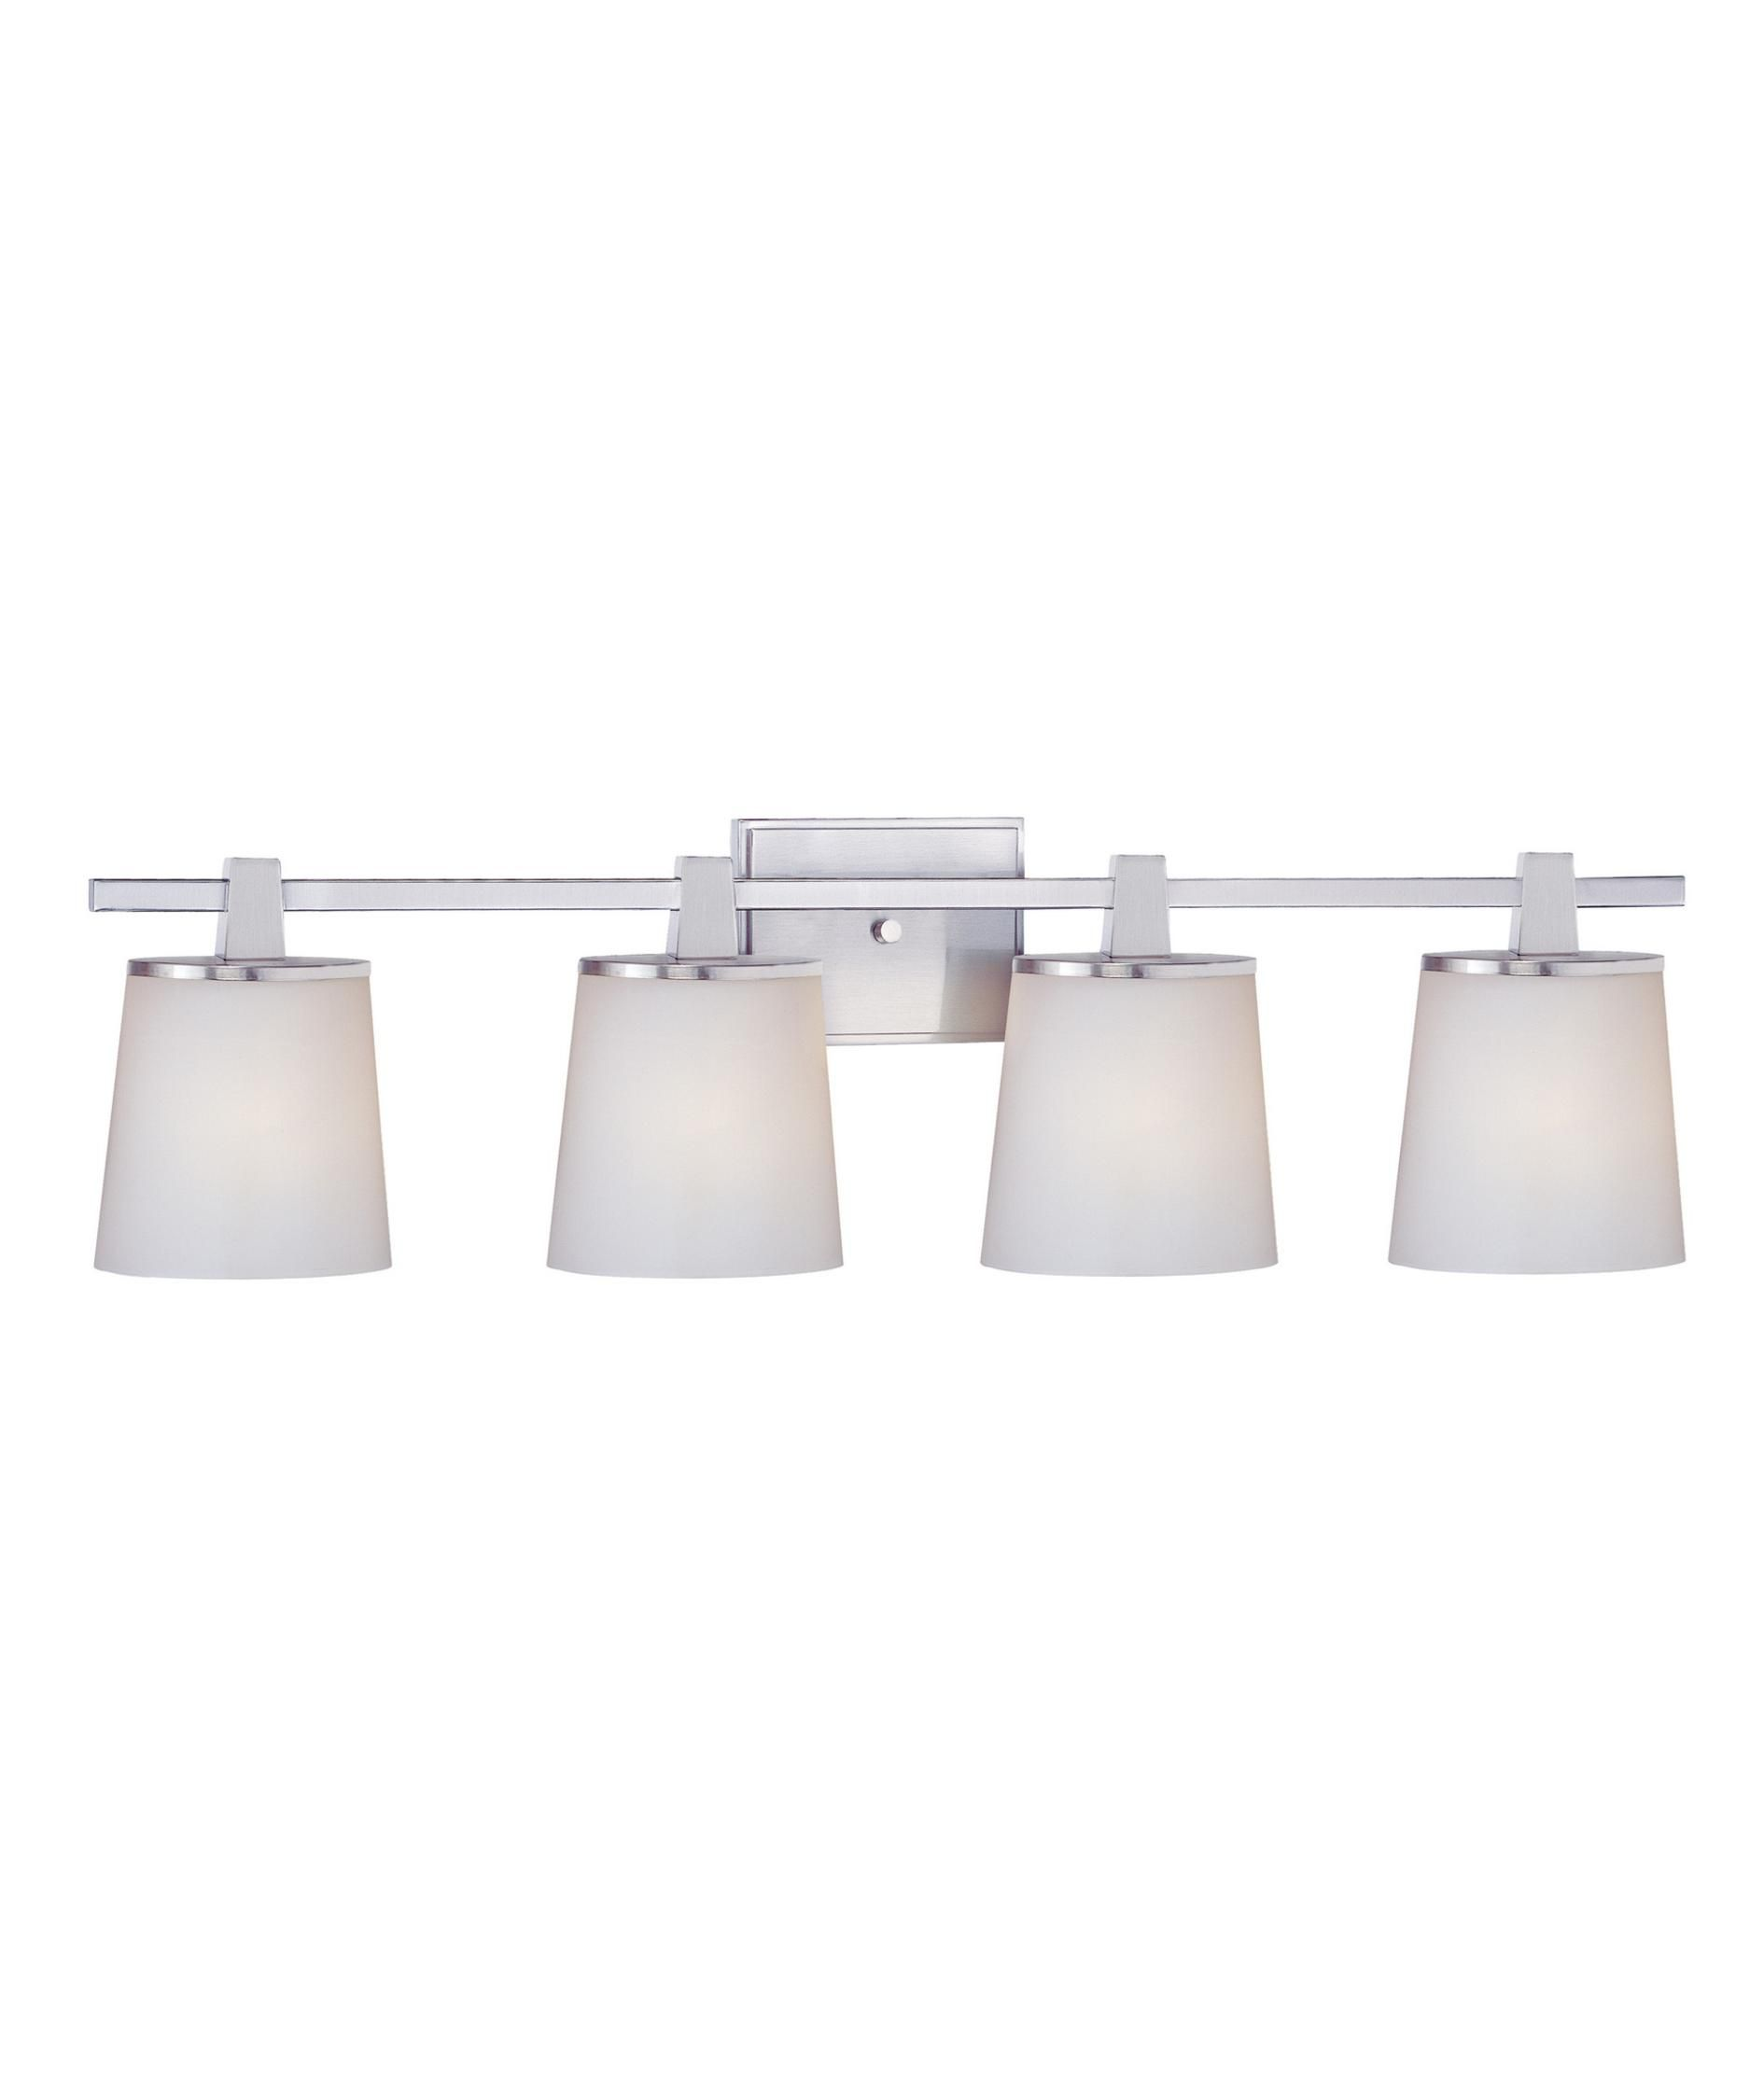 Dolan Designs 3784 Ellipse 33 Inch Bath Vanity Light | Bathroom ...